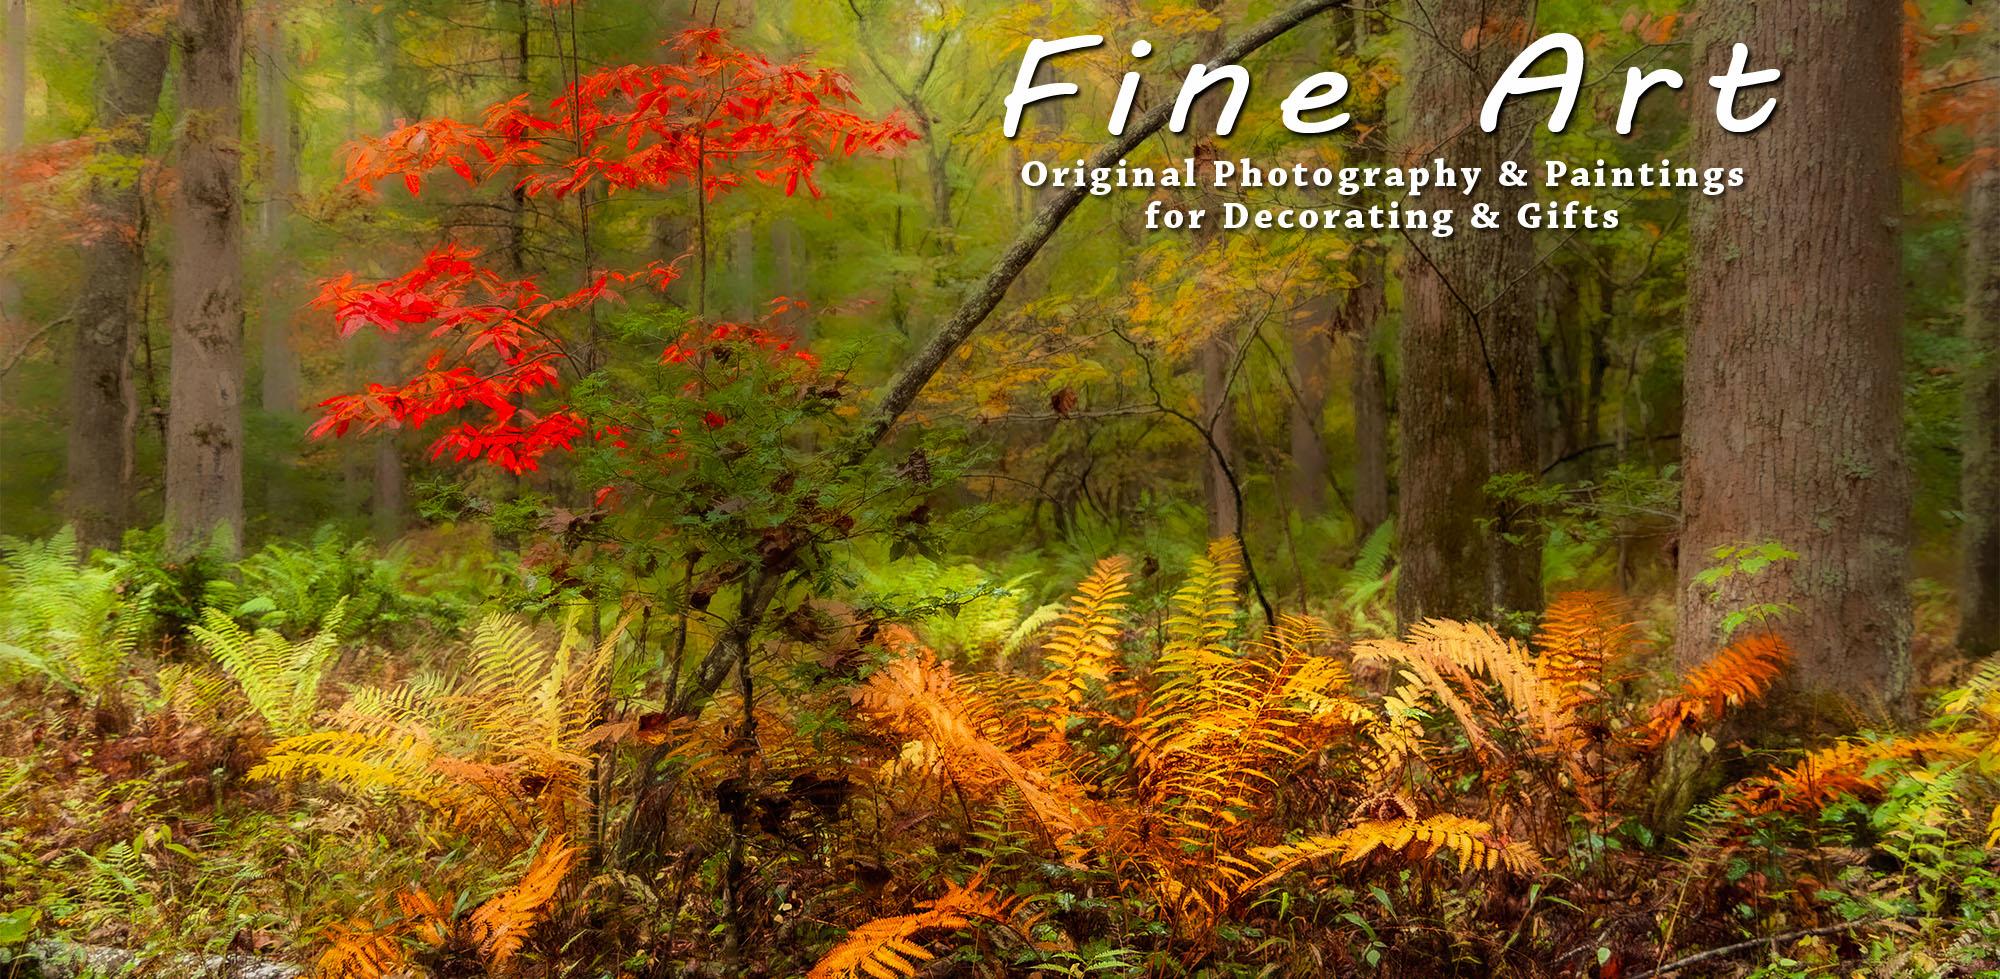 The Fine Art Place